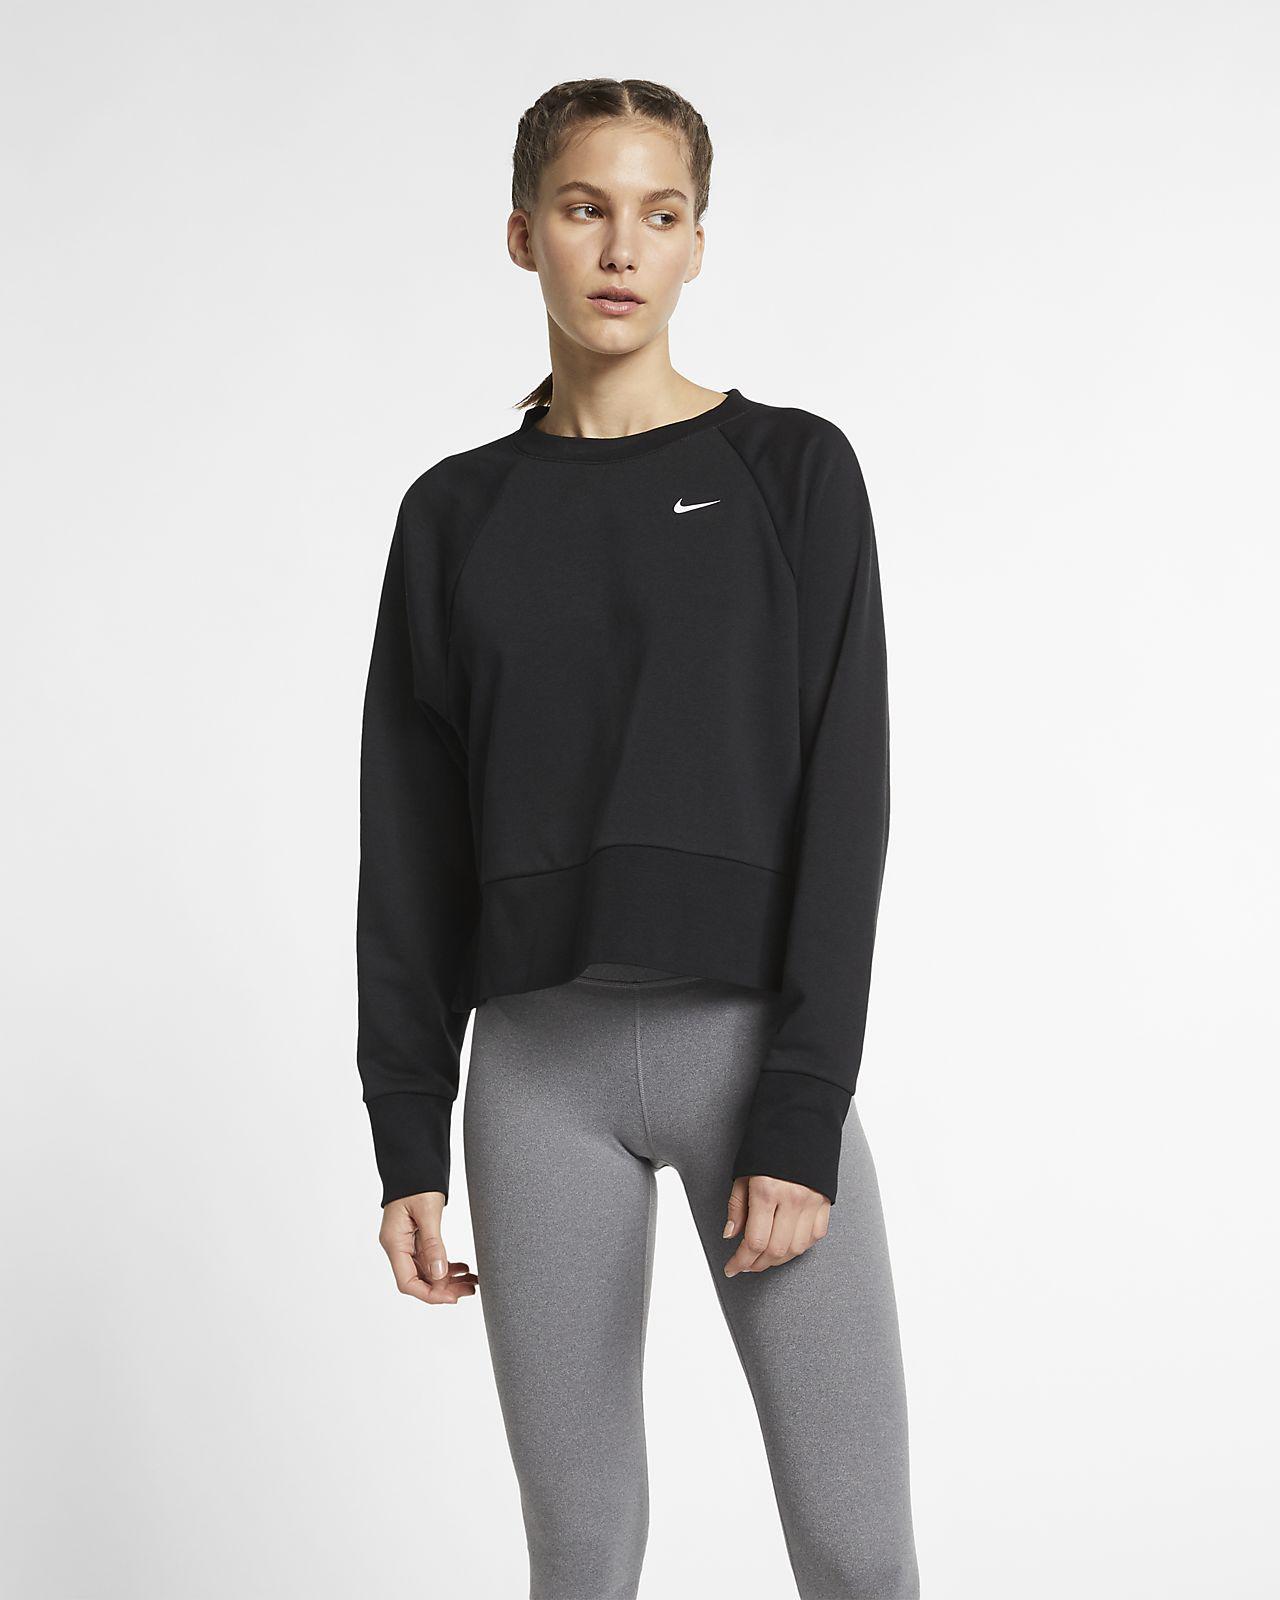 Nike Dri-FIT Women's Long-Sleeve Training Top